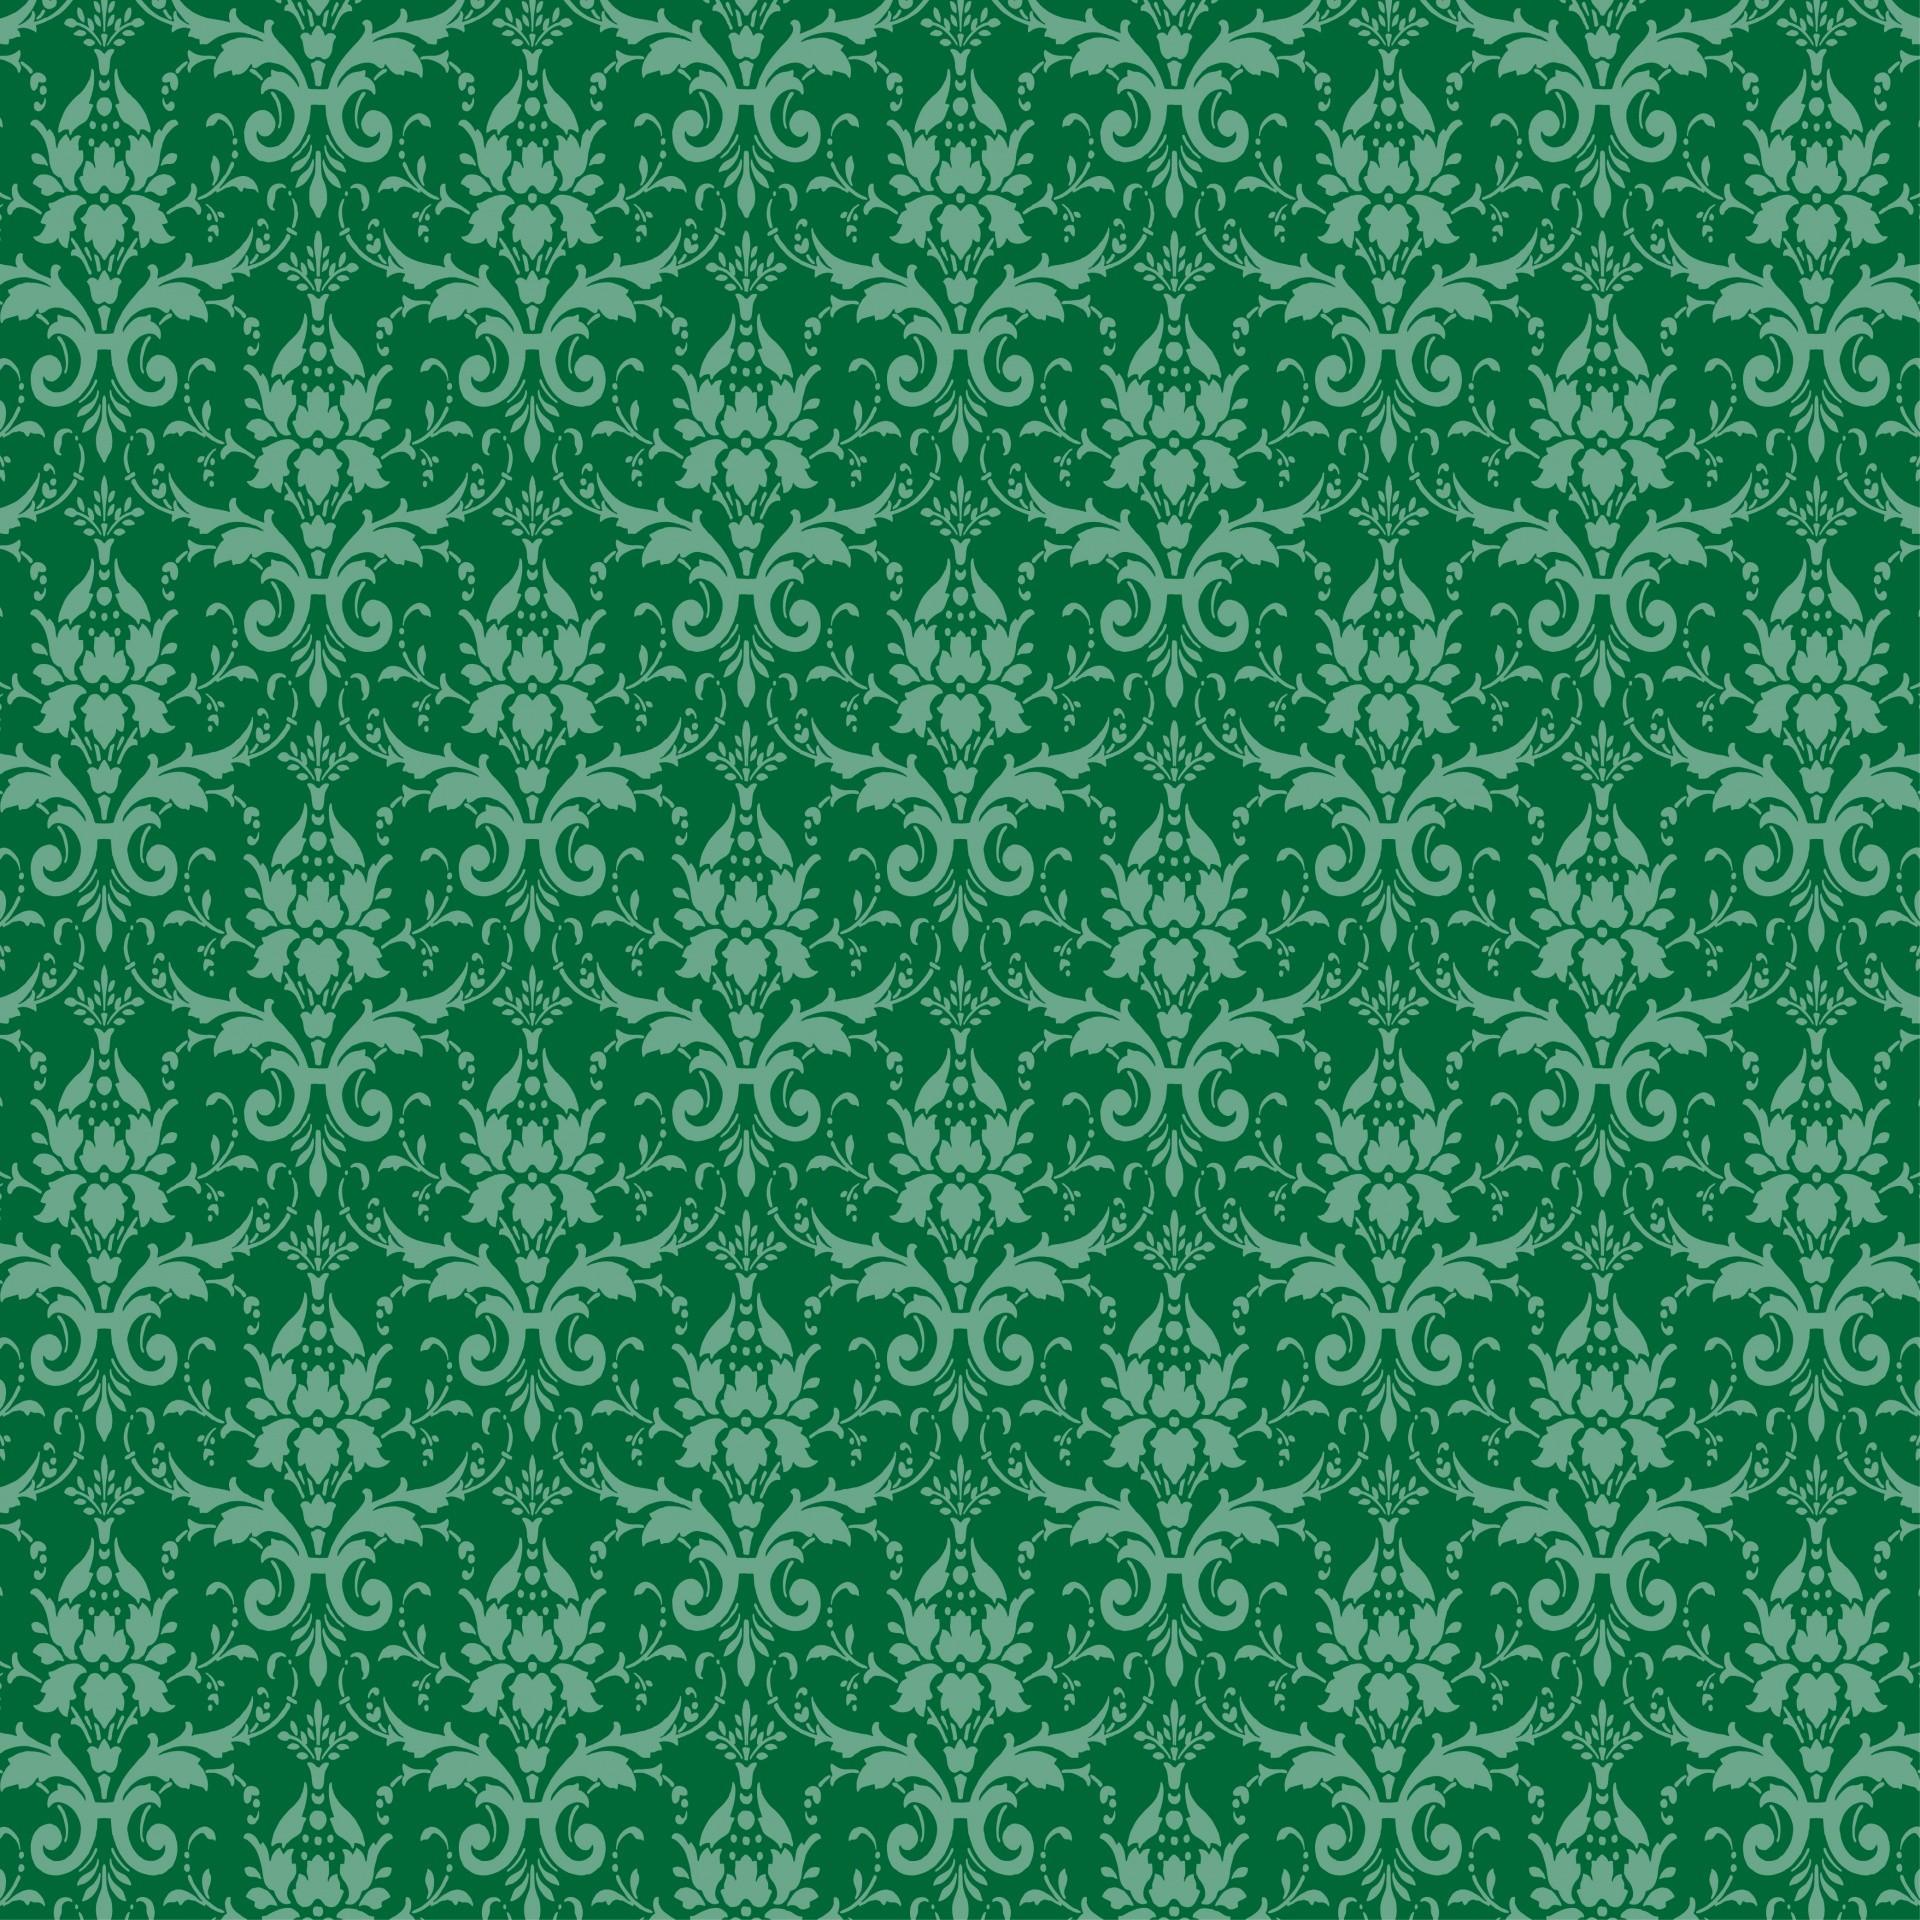 Damask Green Wallpaper